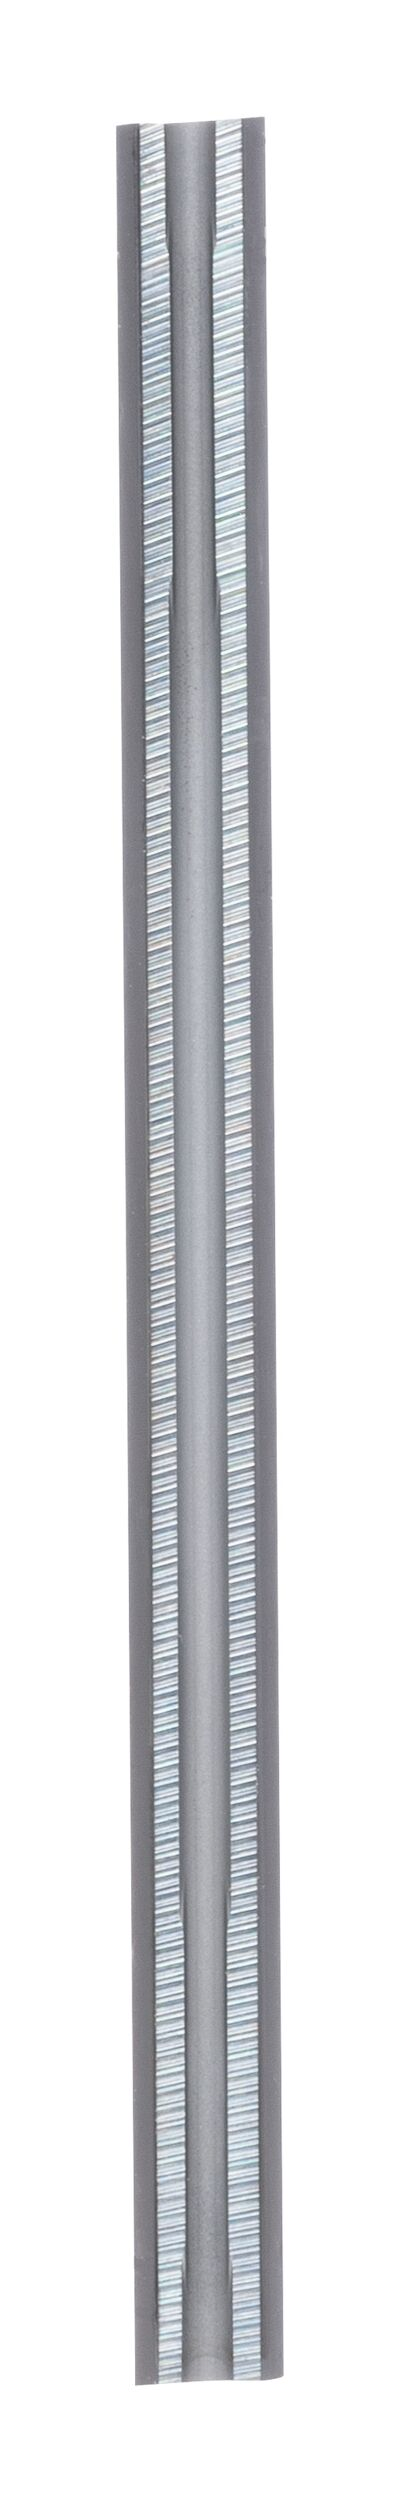 Bosch Zubehör HM Hobelmesser gerade für GHO 12V-20 40° - 56 x... 2608000673 (10 Stück)